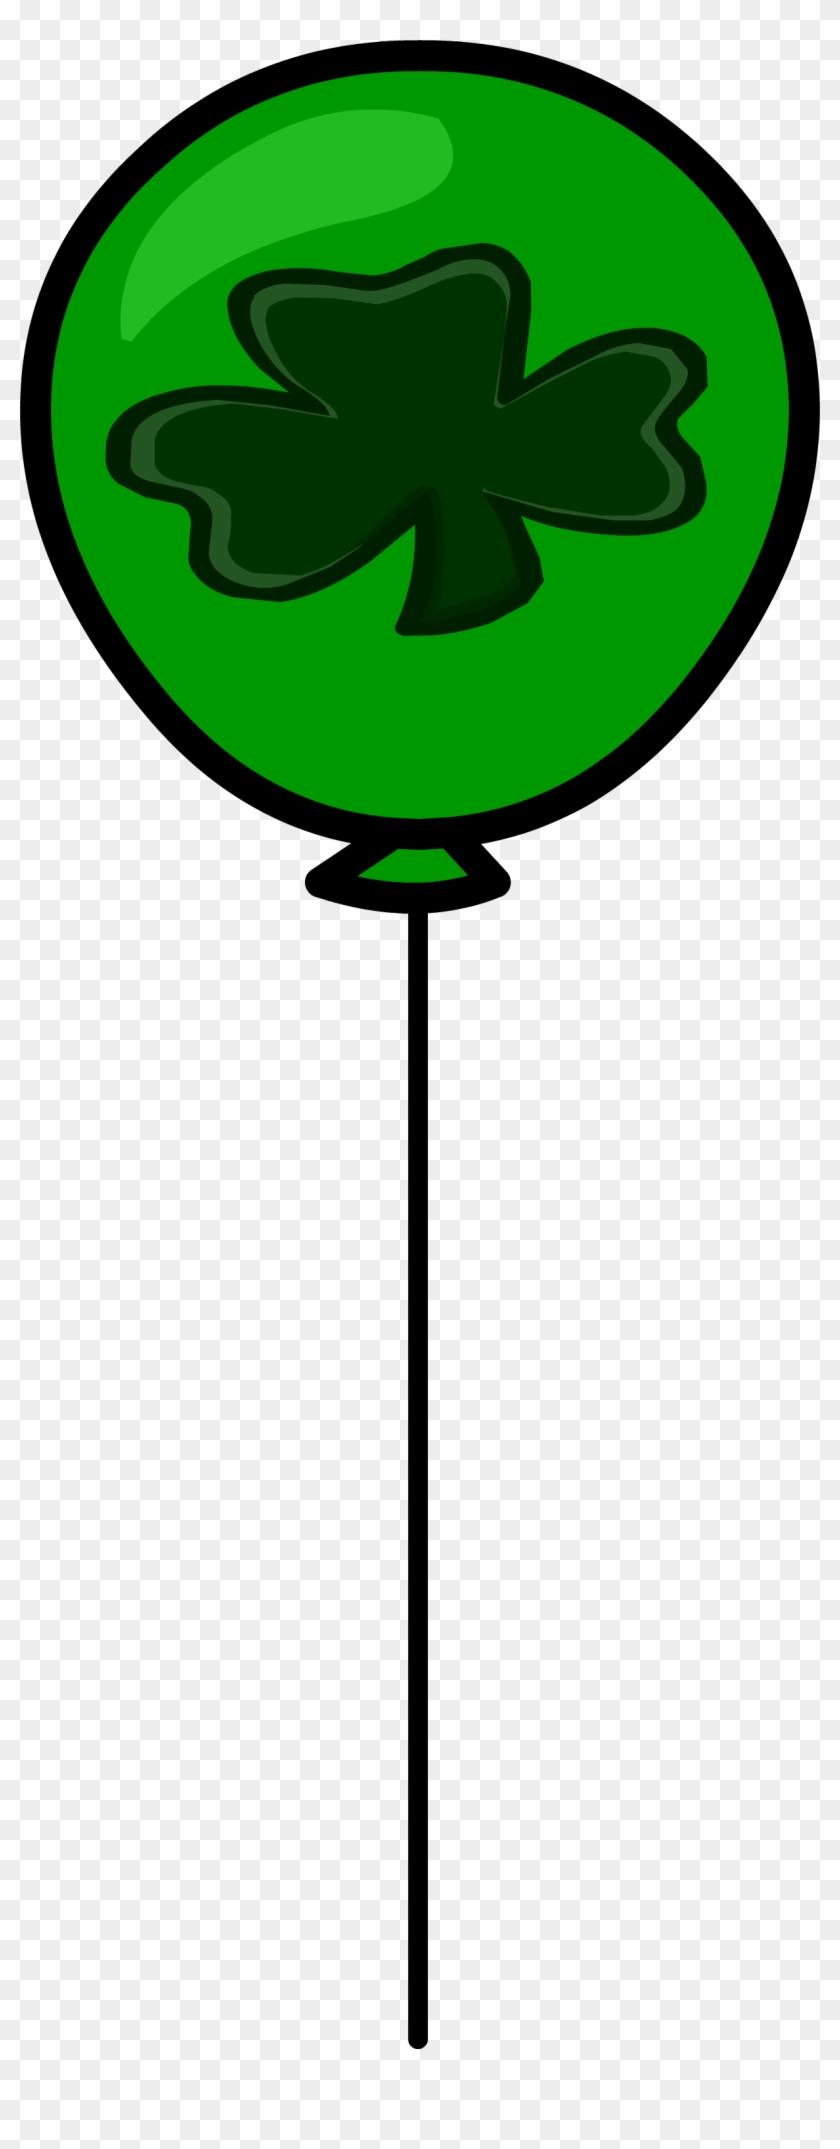 Clover Balloon Sprite 006 - Open Source #1183741